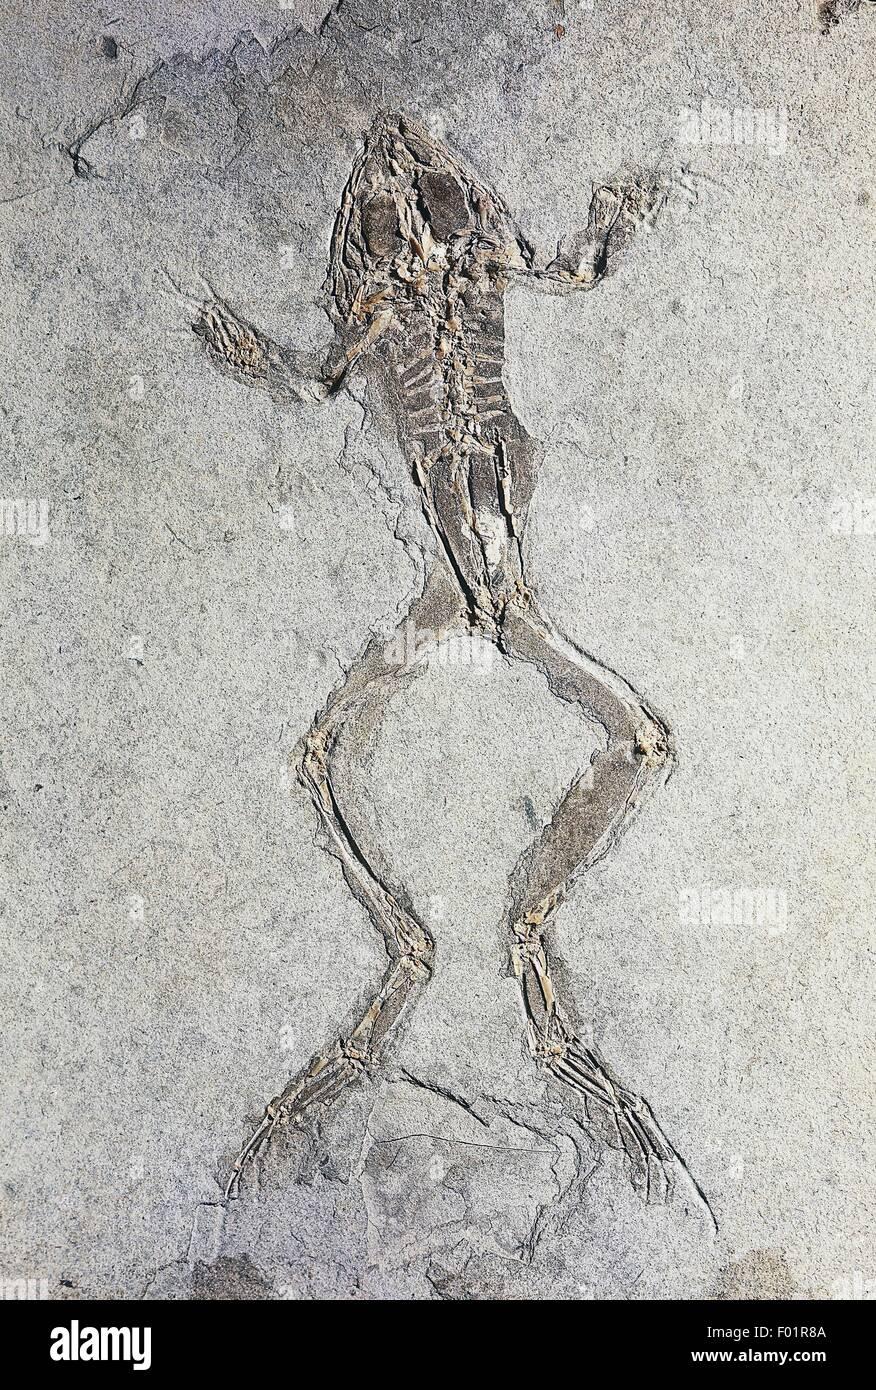 Rana pueyoi fossil, Amphibians, Late Miocene Age, Libros, Spain. - Stock Image